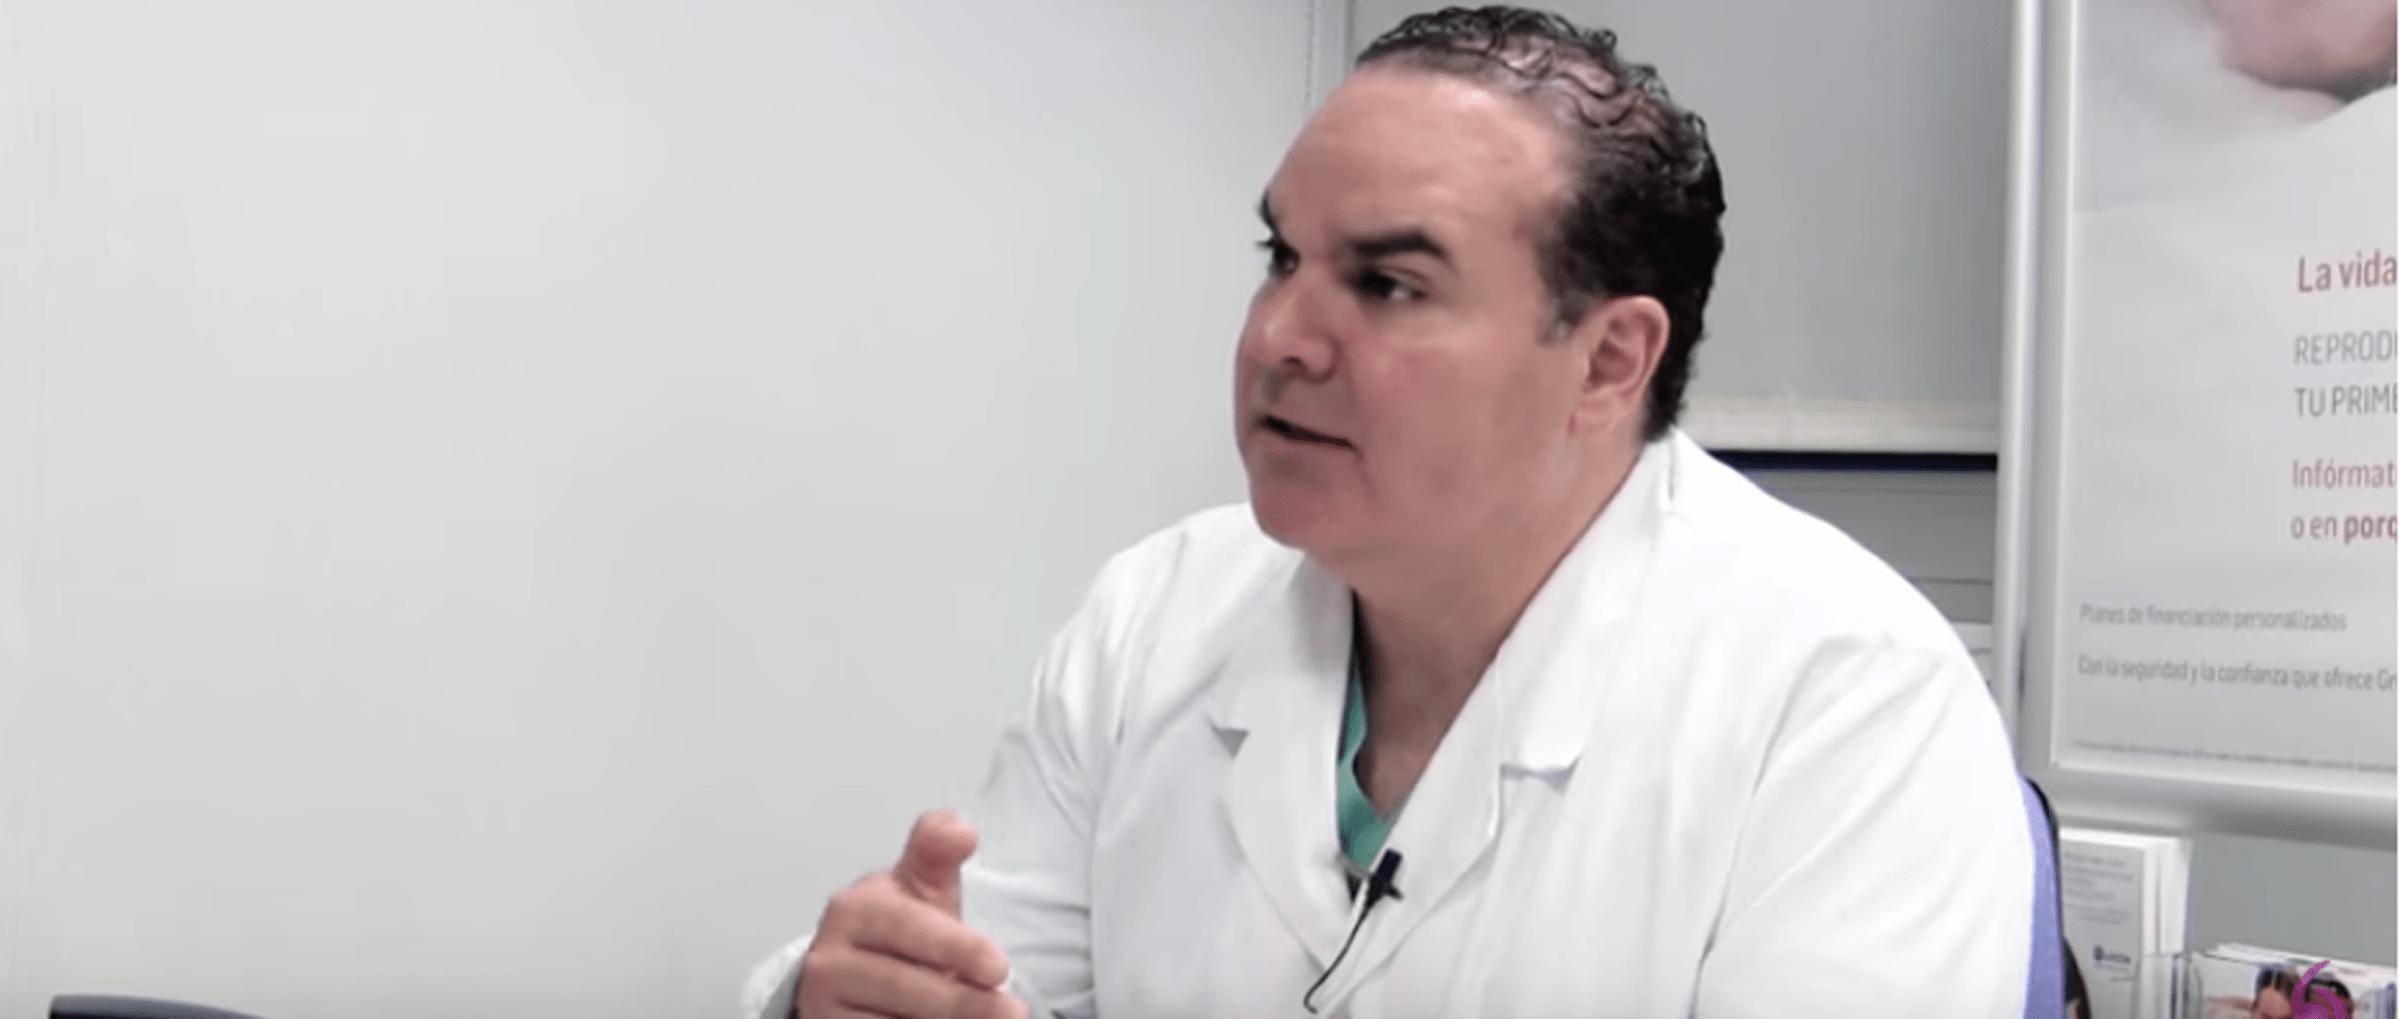 Dr Victor Villalobos (gynaecologist)